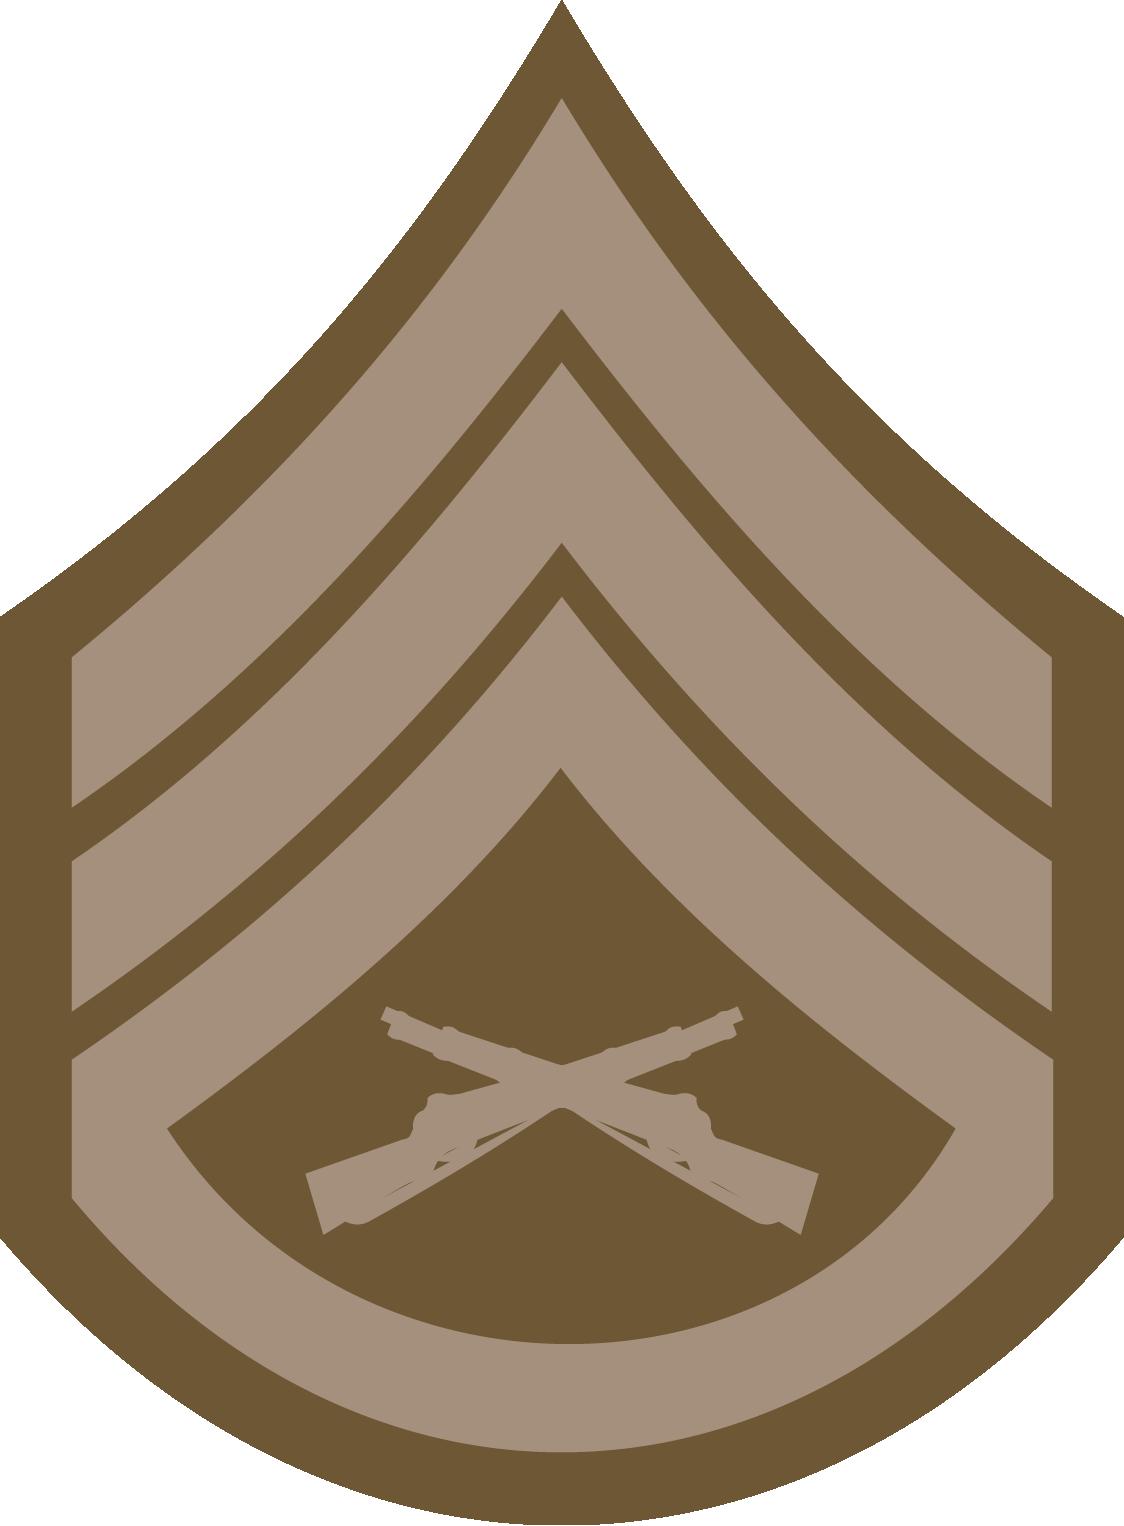 Platoon Sergeant